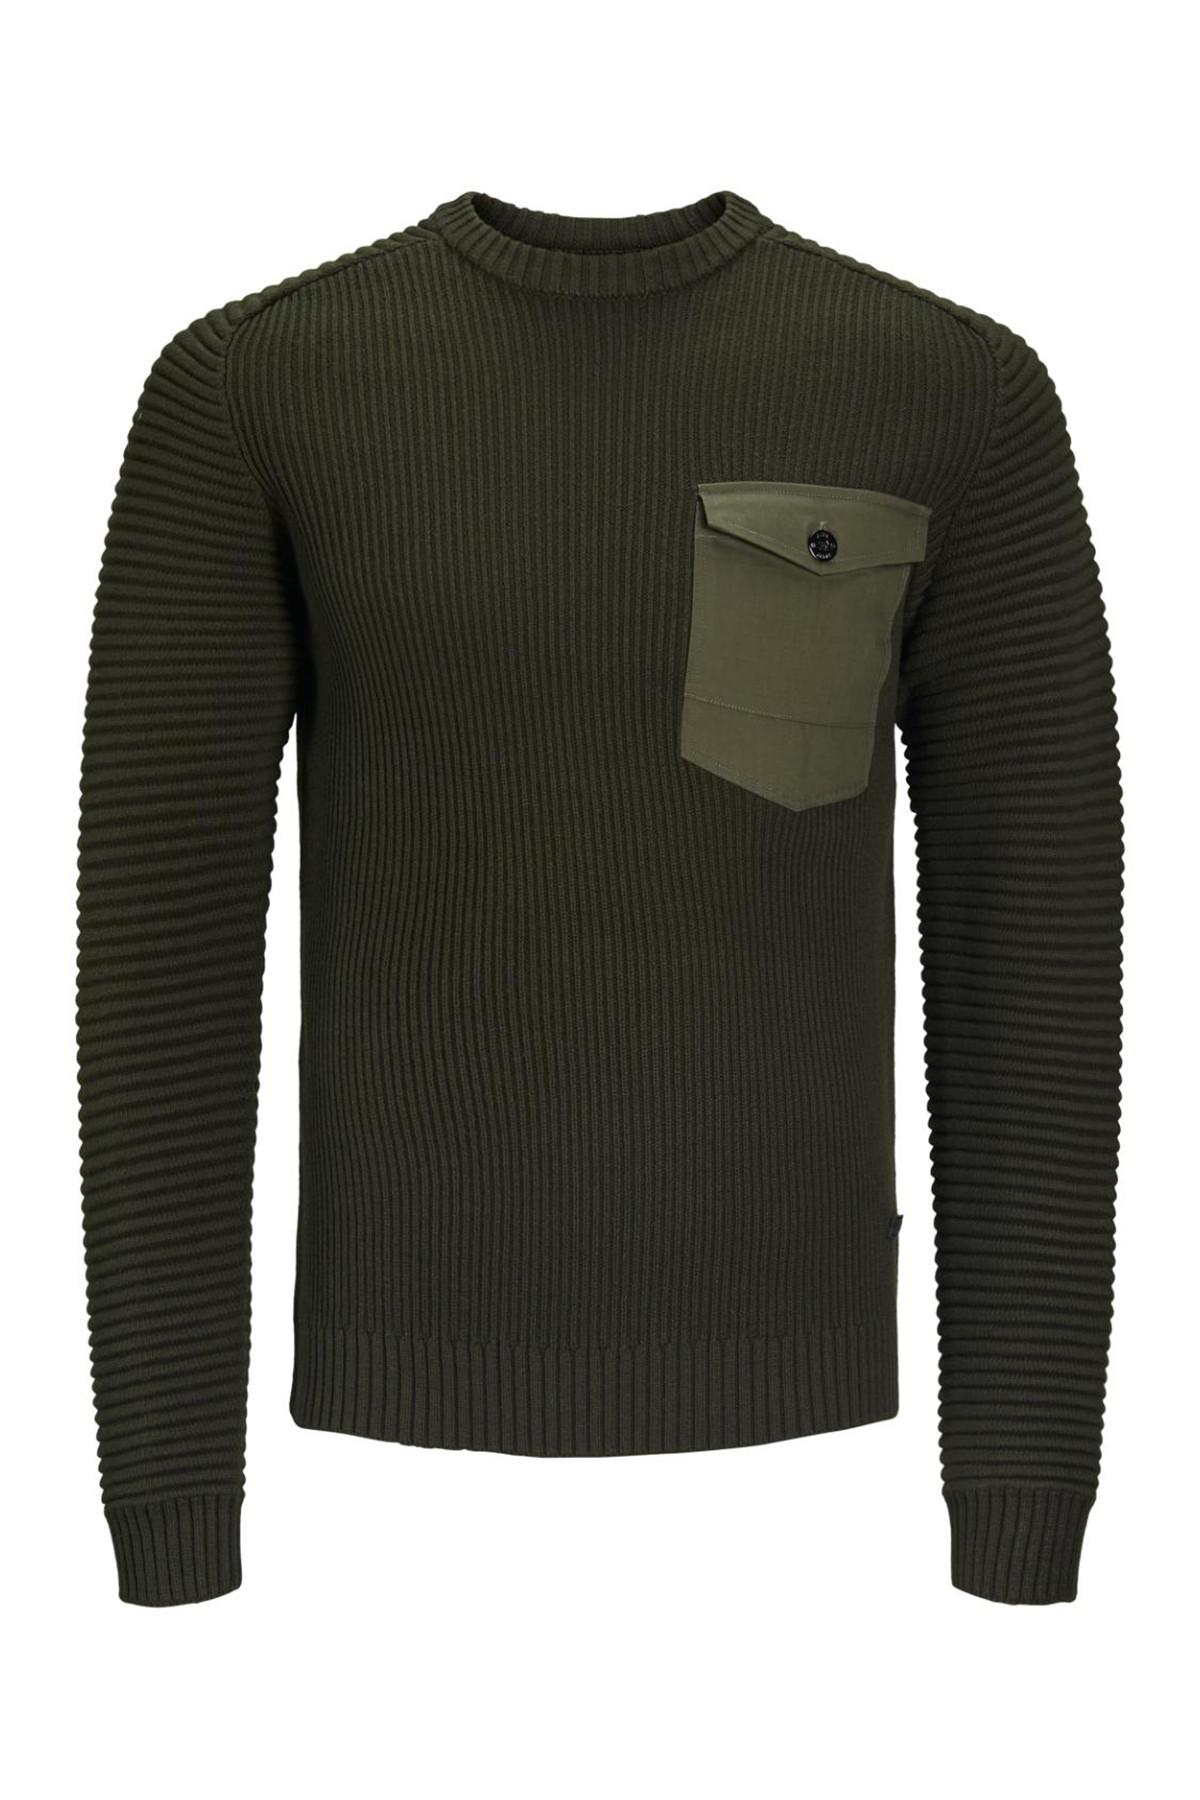 a6dbb4c06ec1 jack-jones-Rosin-Jcocalgary-Knit-Crew-Neck-Sweater-Pullover.jpeg